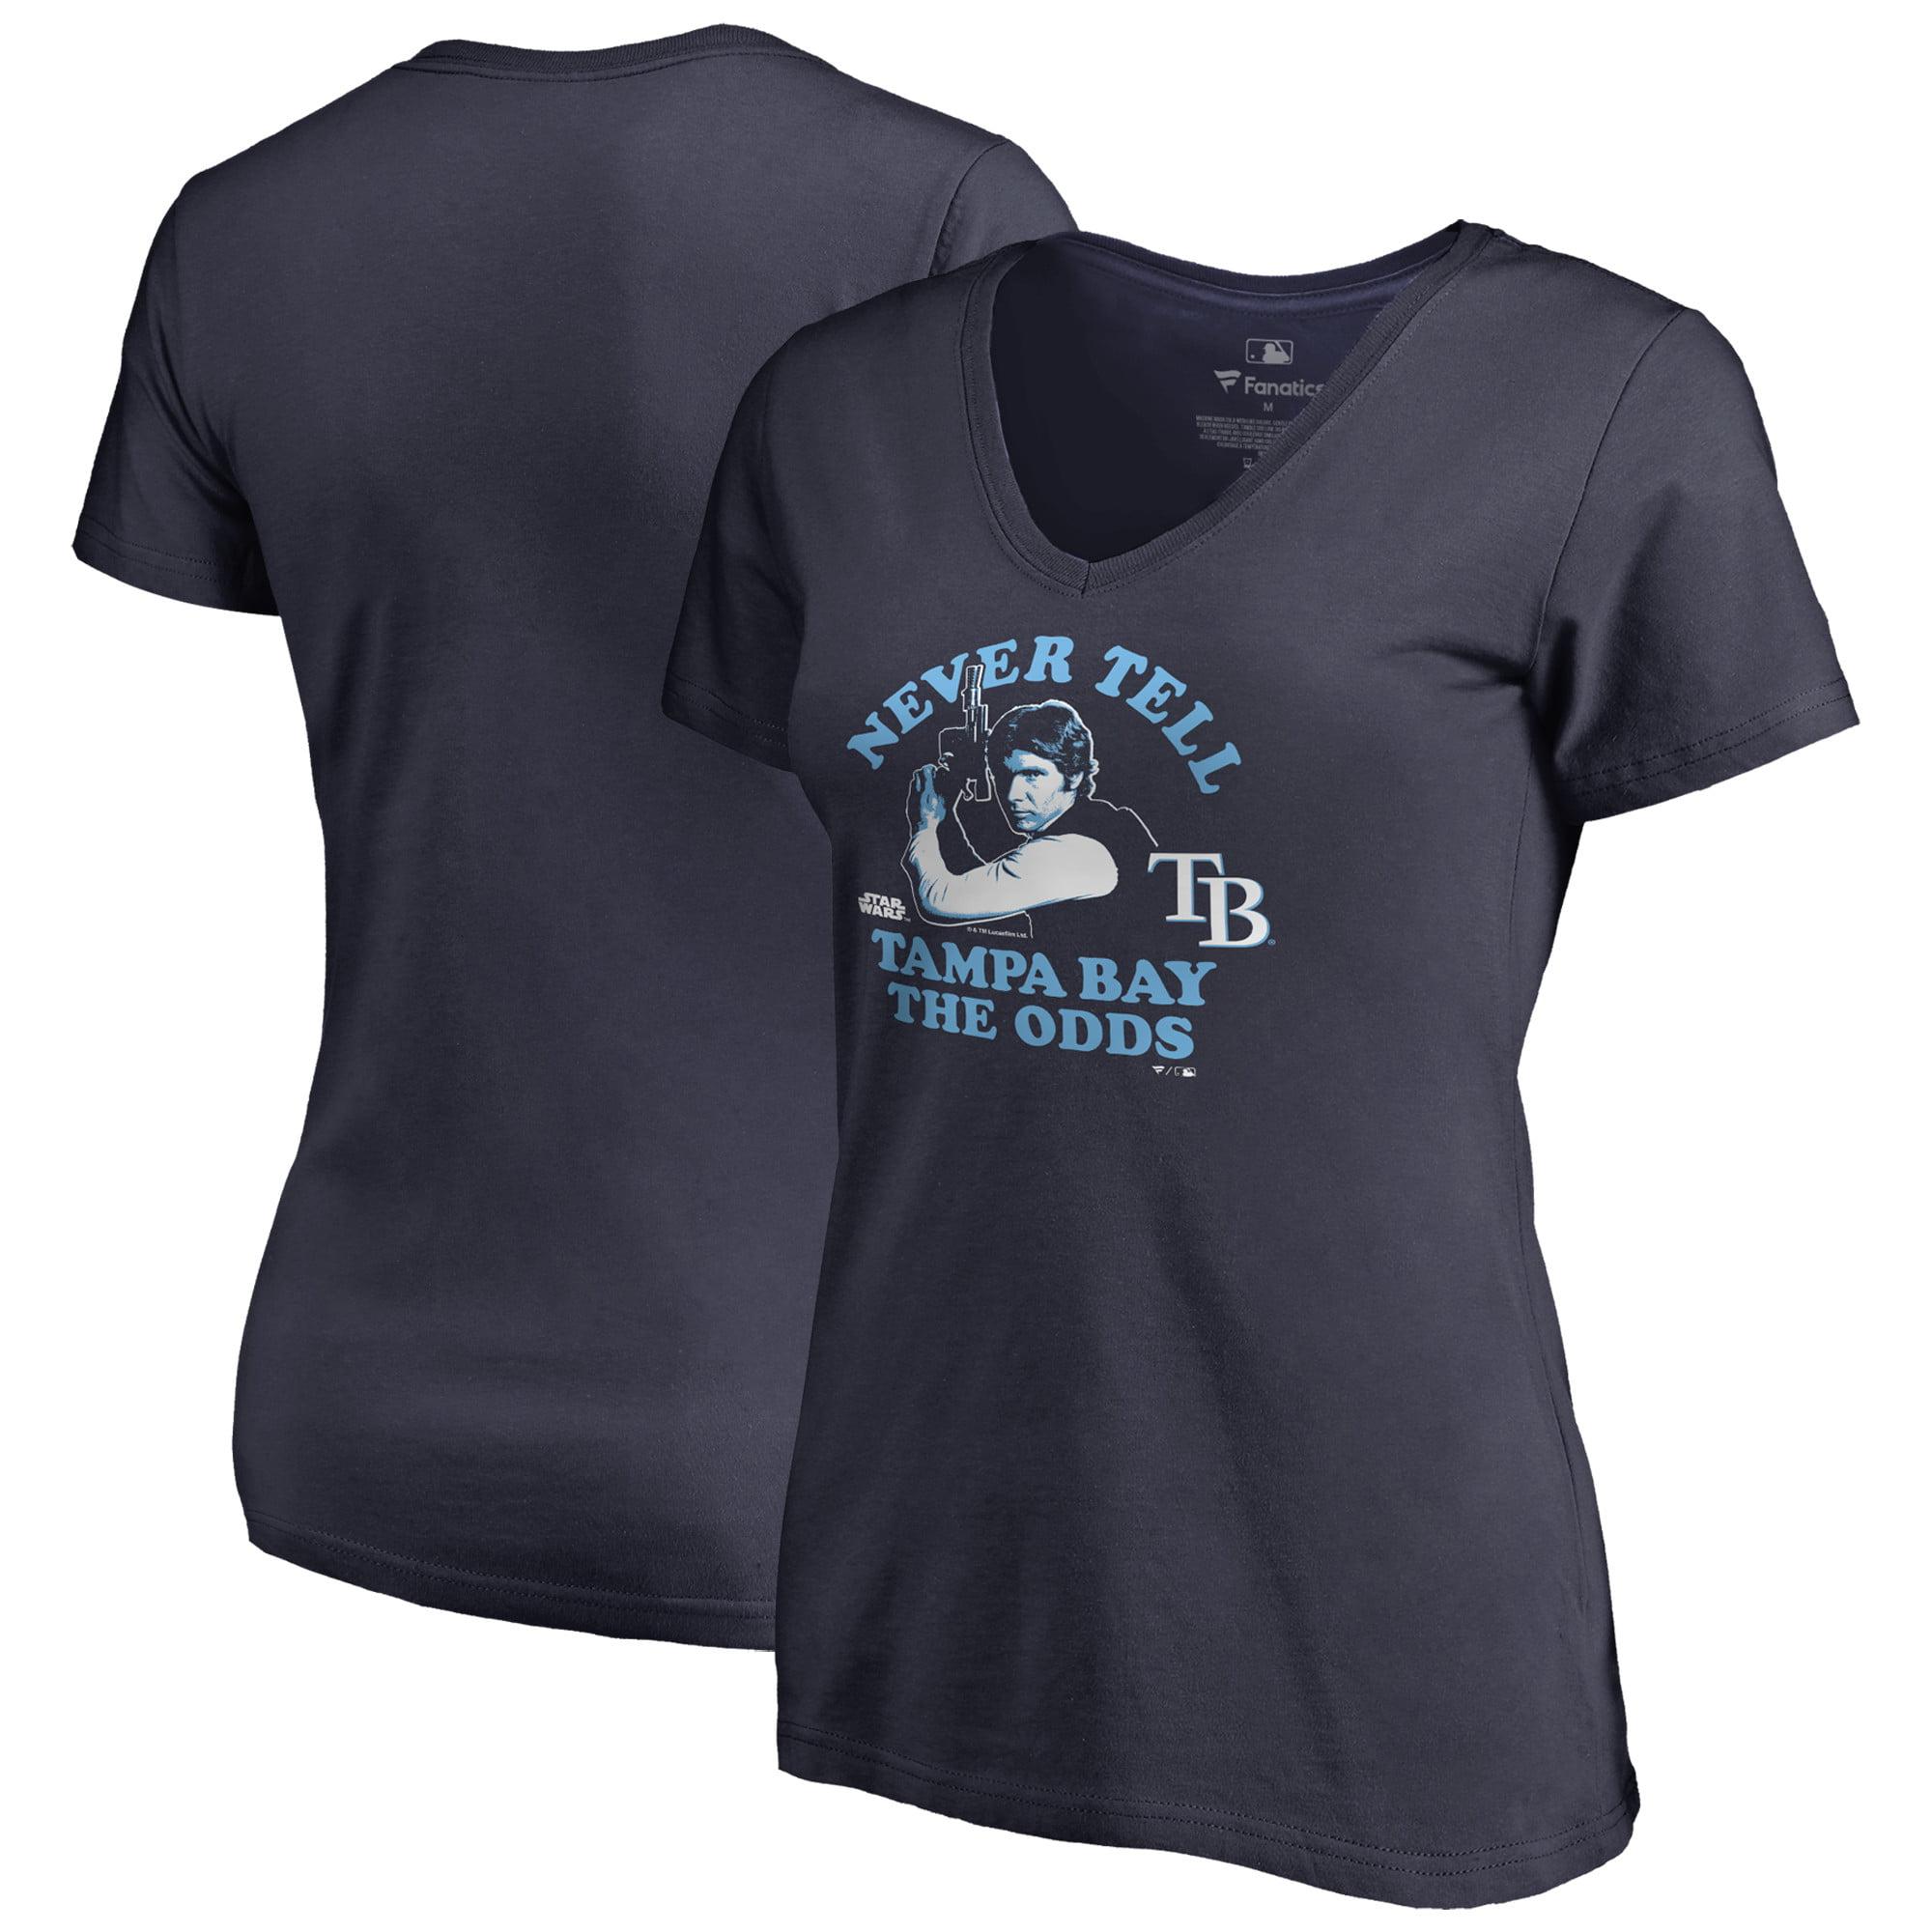 Tampa Bay Rays Fanatics Branded Women's Star Wars Never Tell the Odds V-Neck T-Shirt - Navy